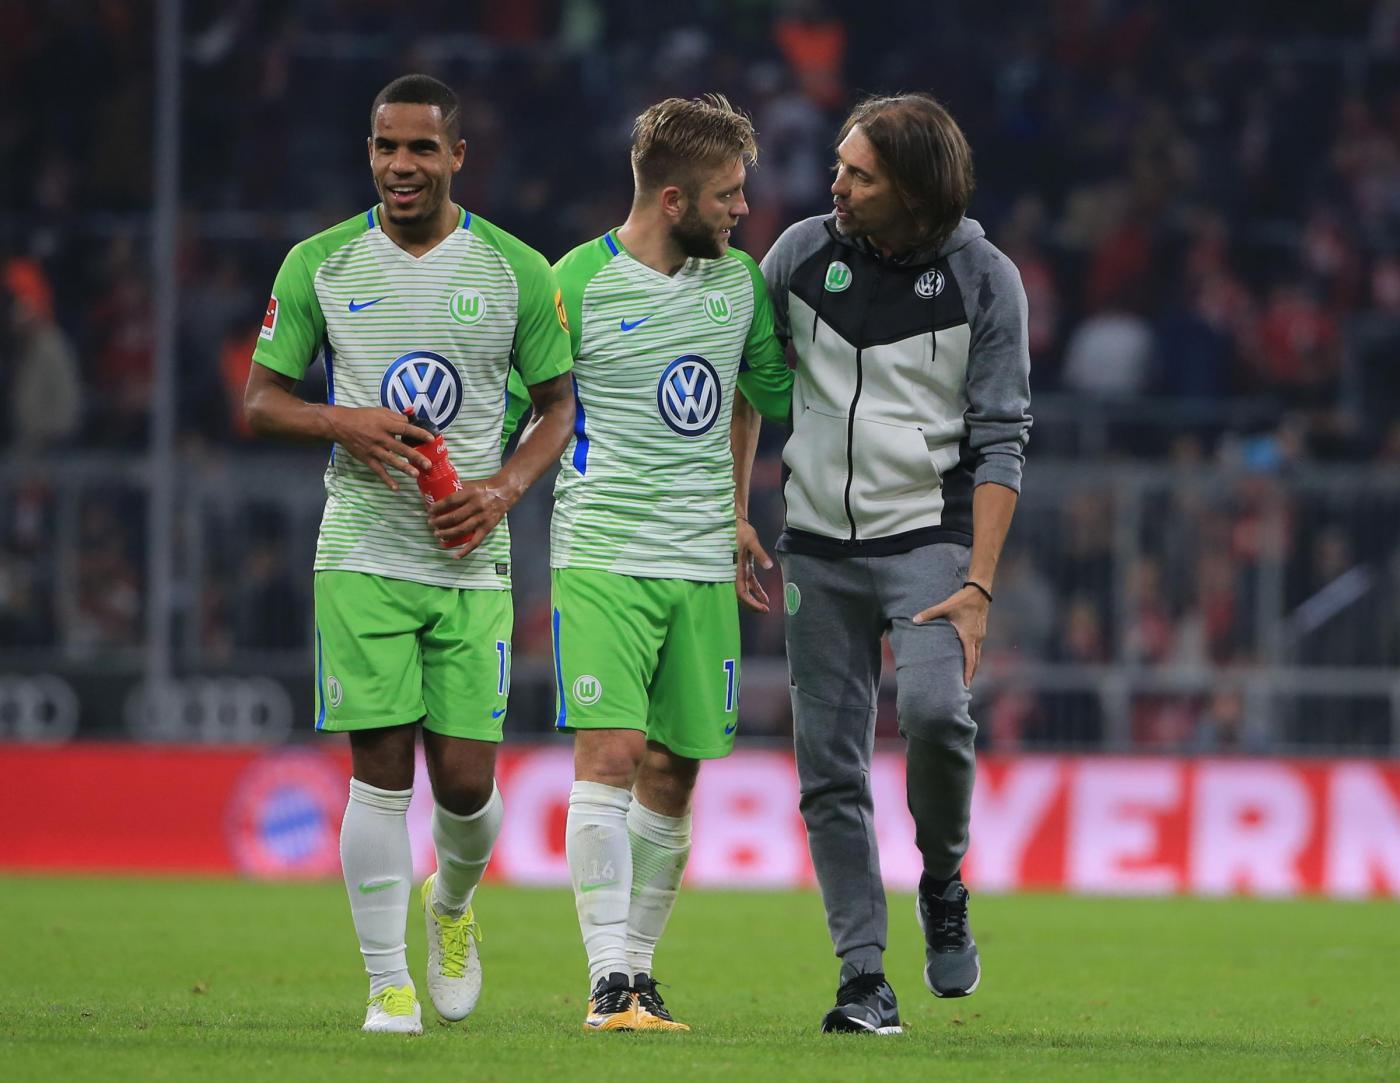 Bundesliga, Wolfsburg-Augusta 11 maggio: lupi motivatissimi per i tre punti